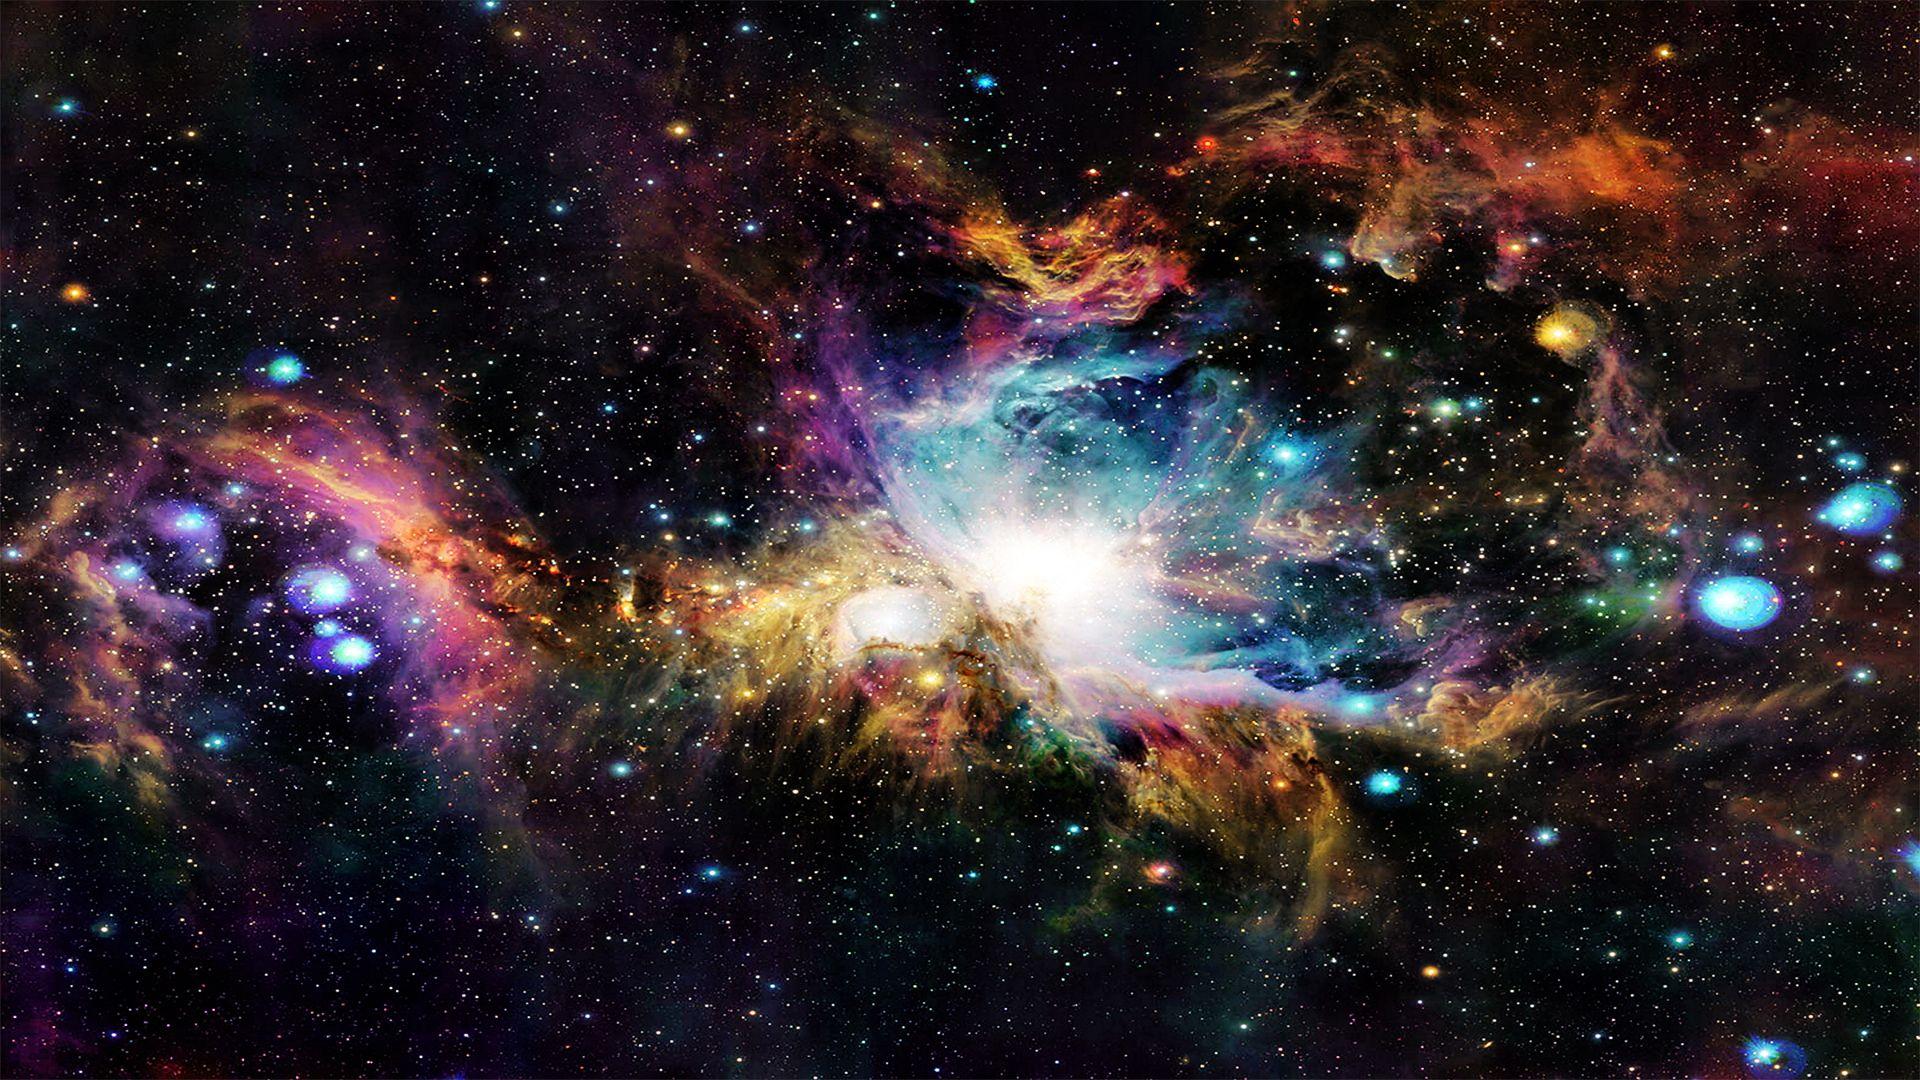 New Trippy Space Wallpaper Dodskypict: Nebula Desktop Backgrounds Hd Cool 7 HD Wallpapers